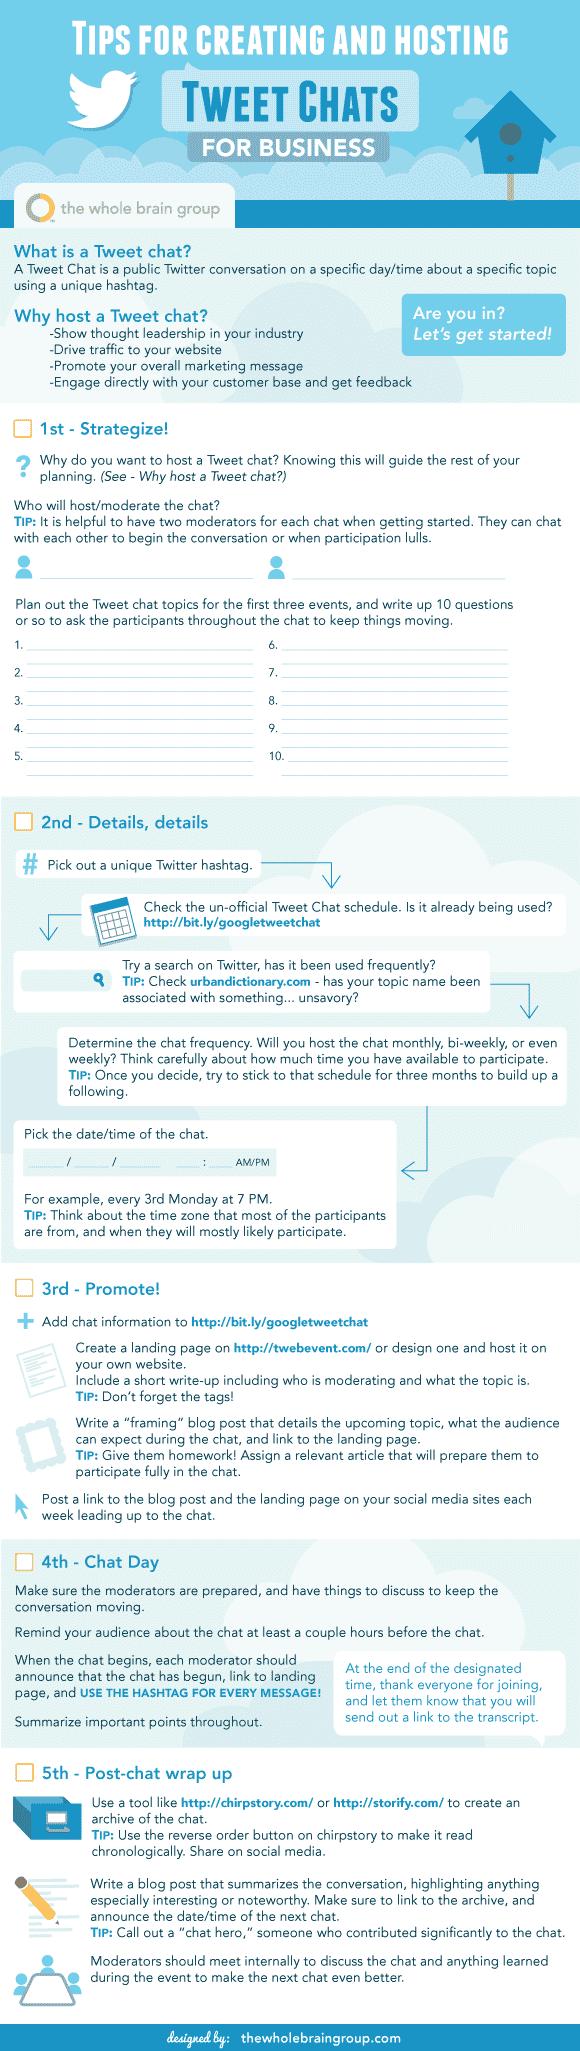 Tweet Chat Infographic